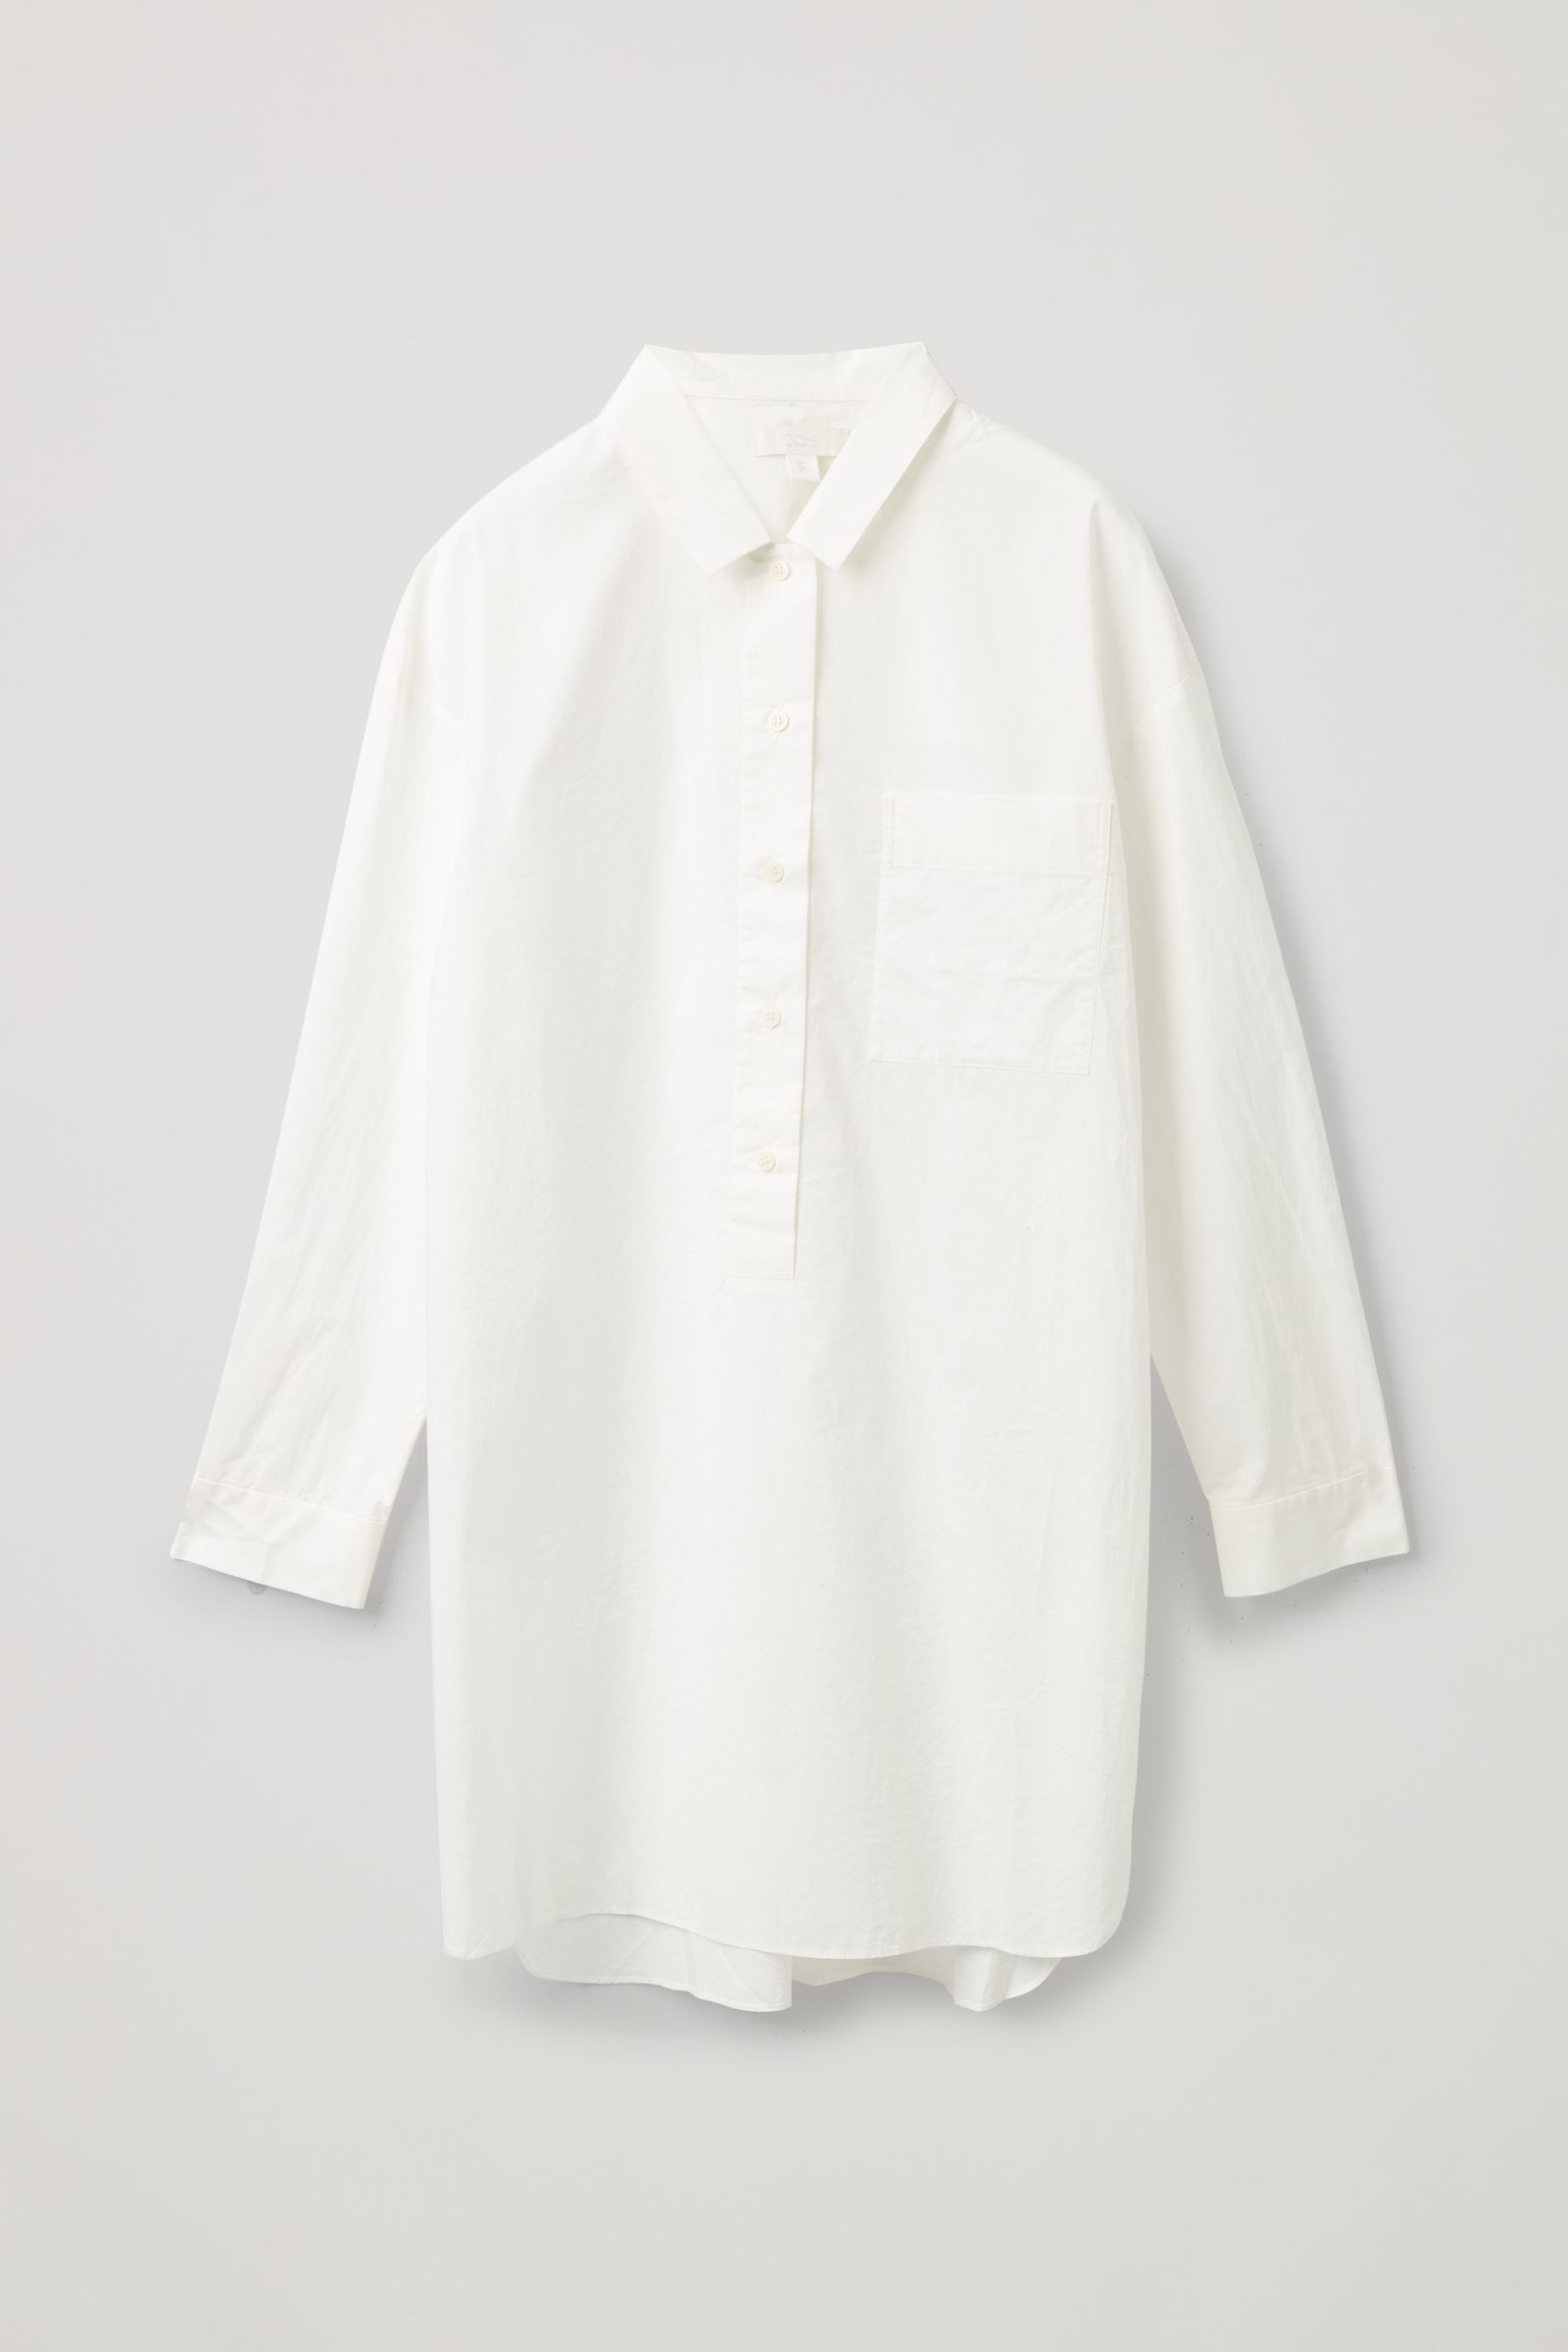 COS 코튼 포플린 셔츠 드레스의 화이트컬러 Product입니다.